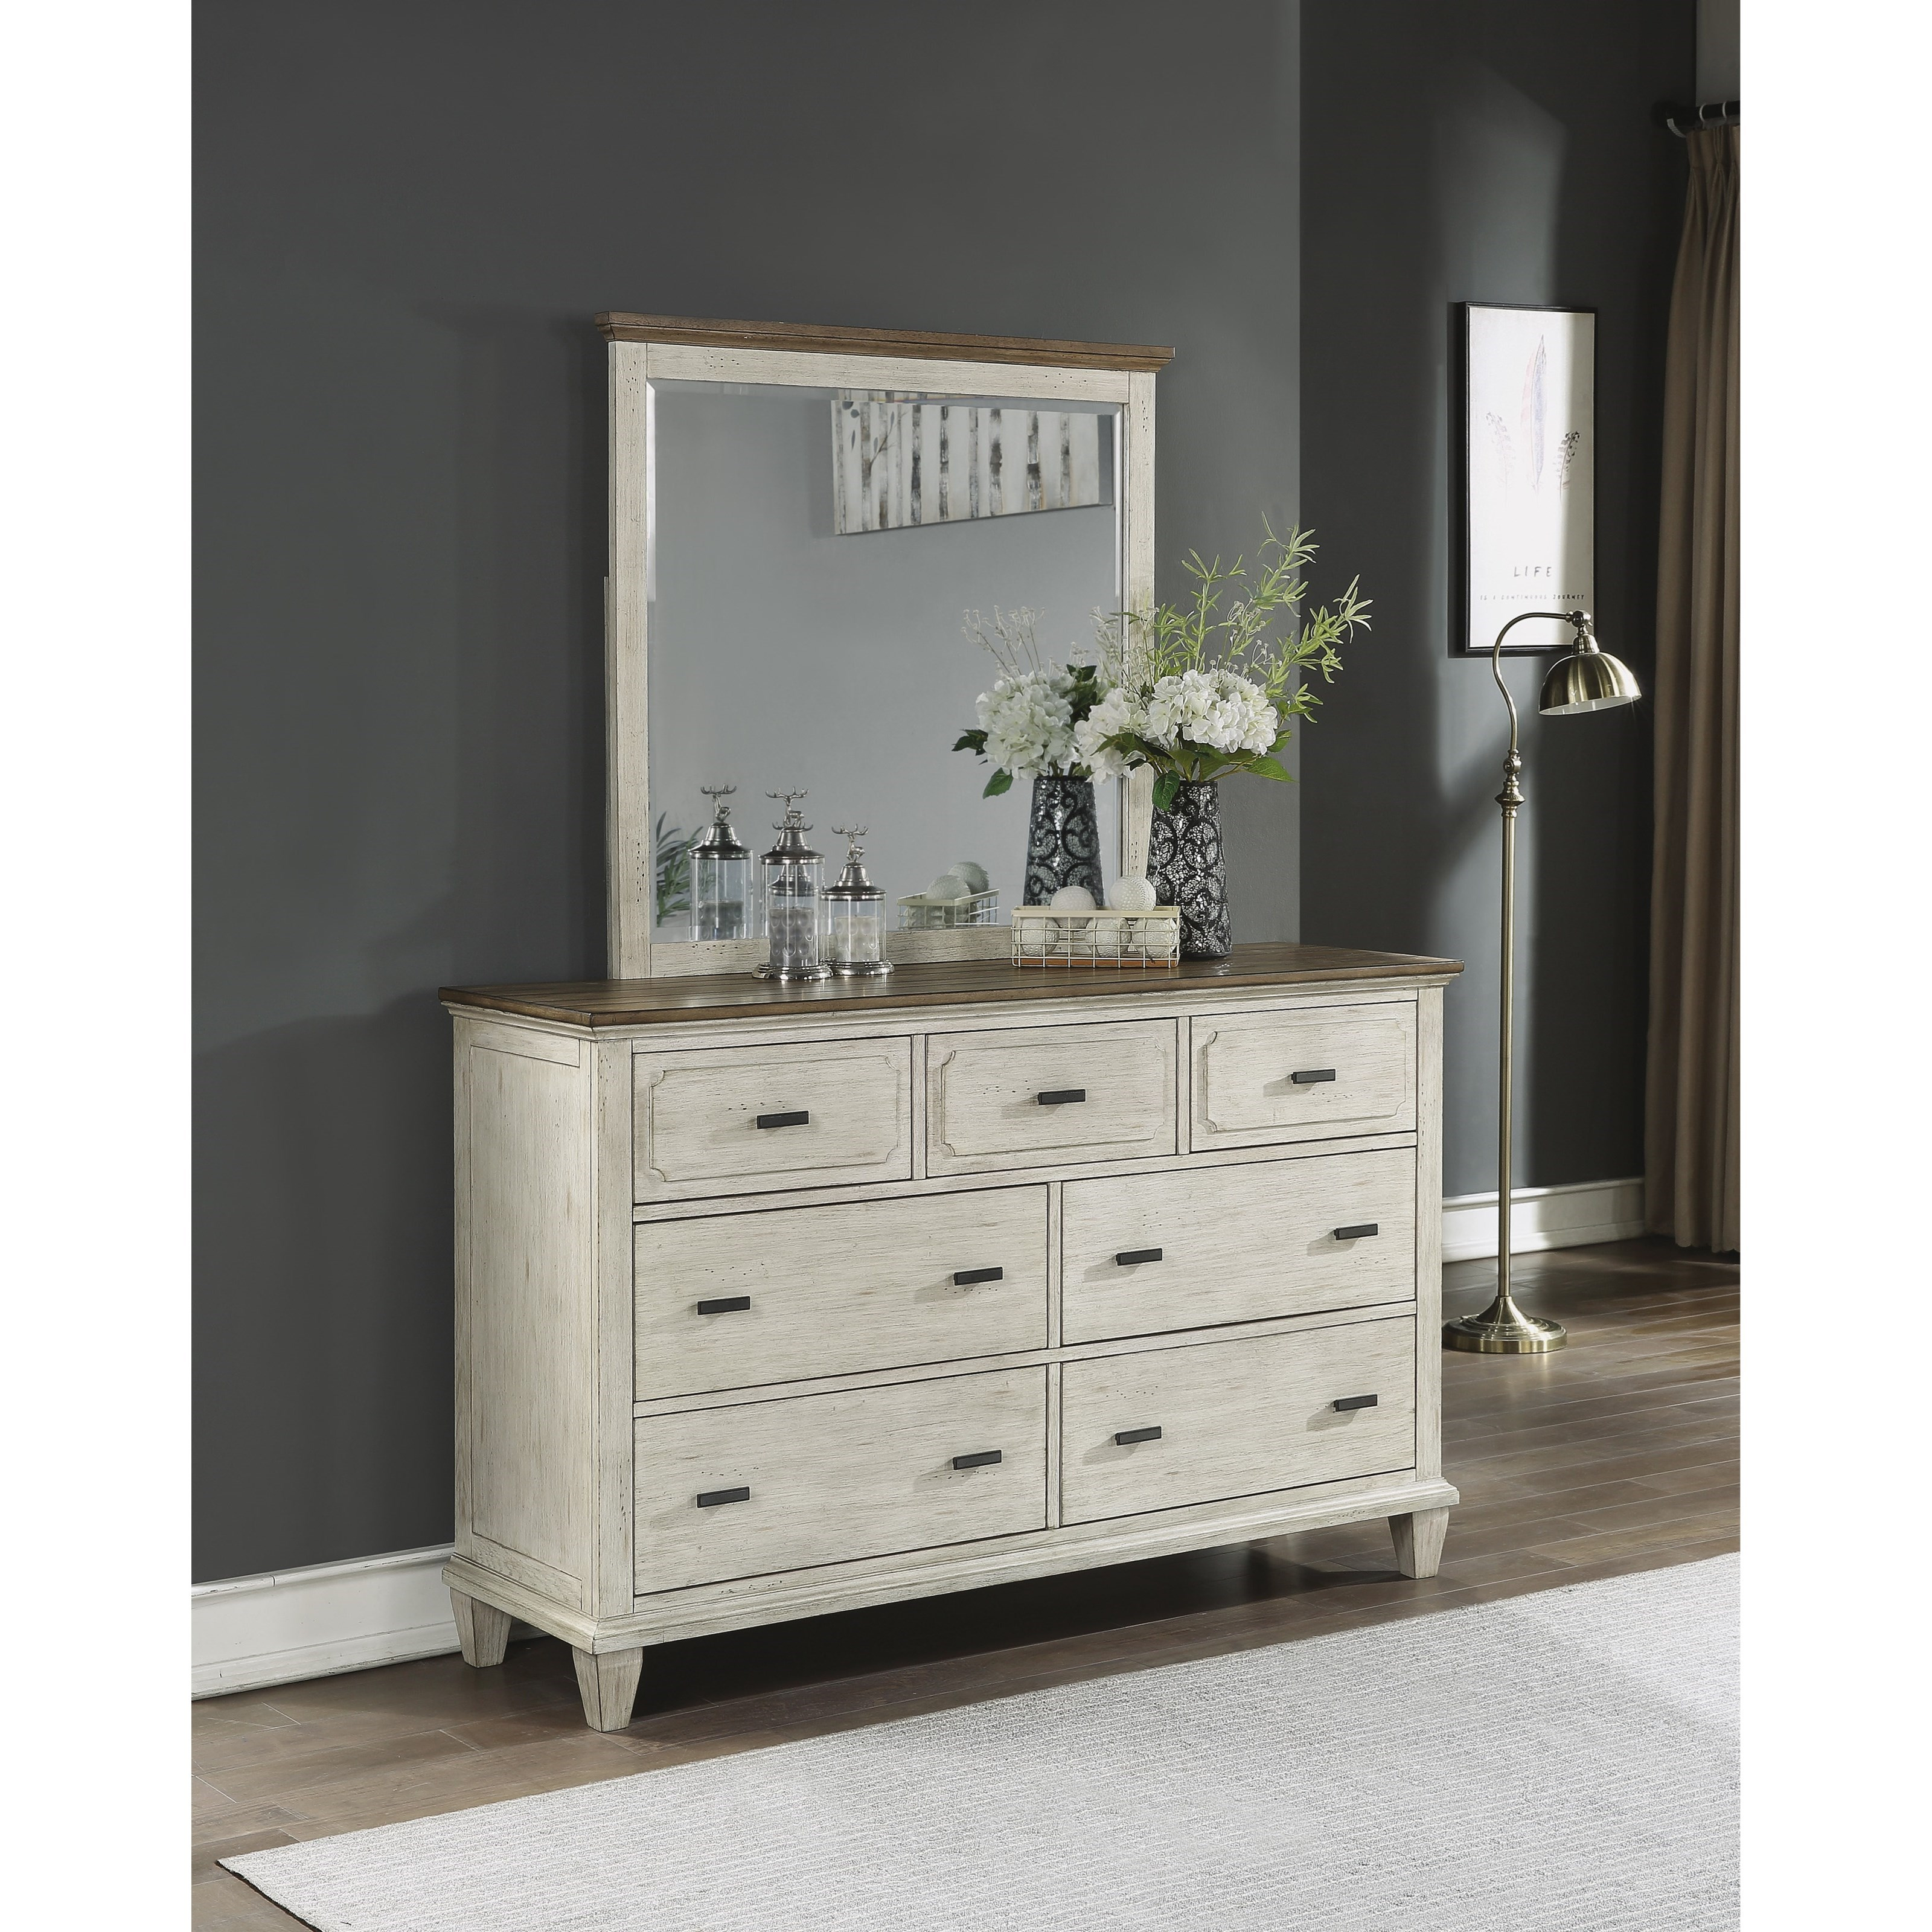 Newport Dresser and Mirror Set by Flexsteel Wynwood Collection at Steger's Furniture